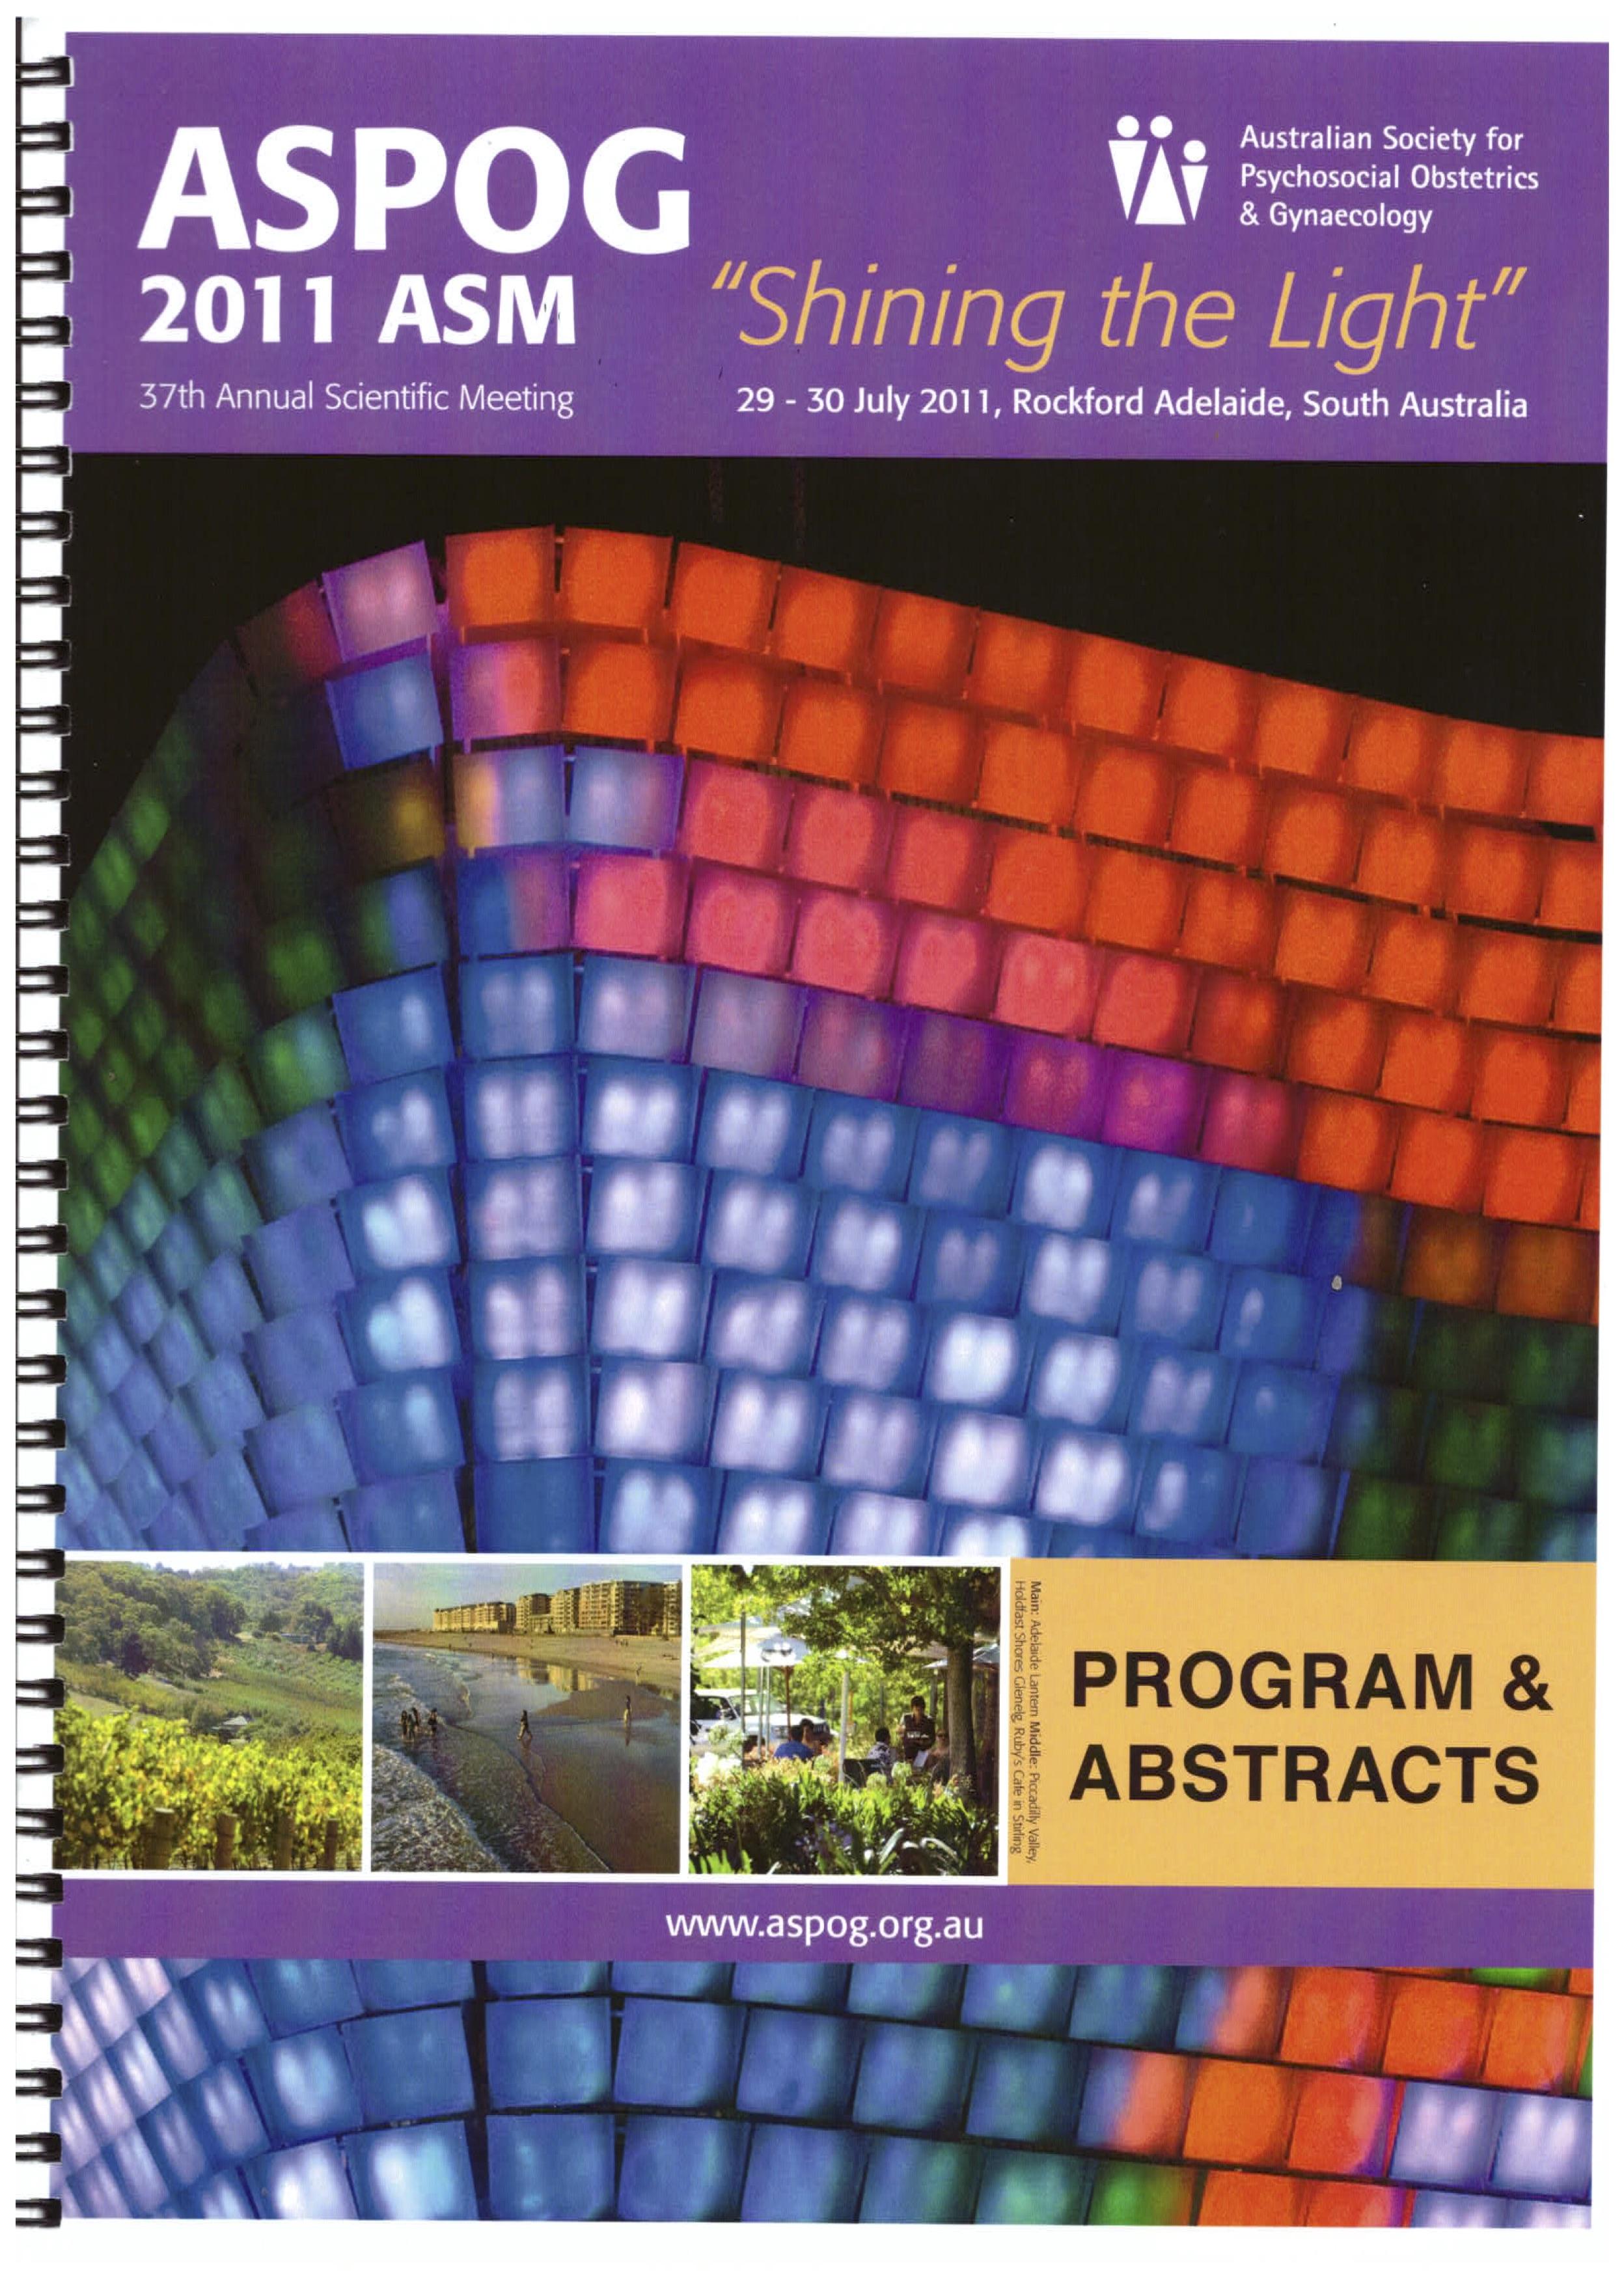 ASPOG 37th Annual Scientific Meeting 2011 - Shining the Light